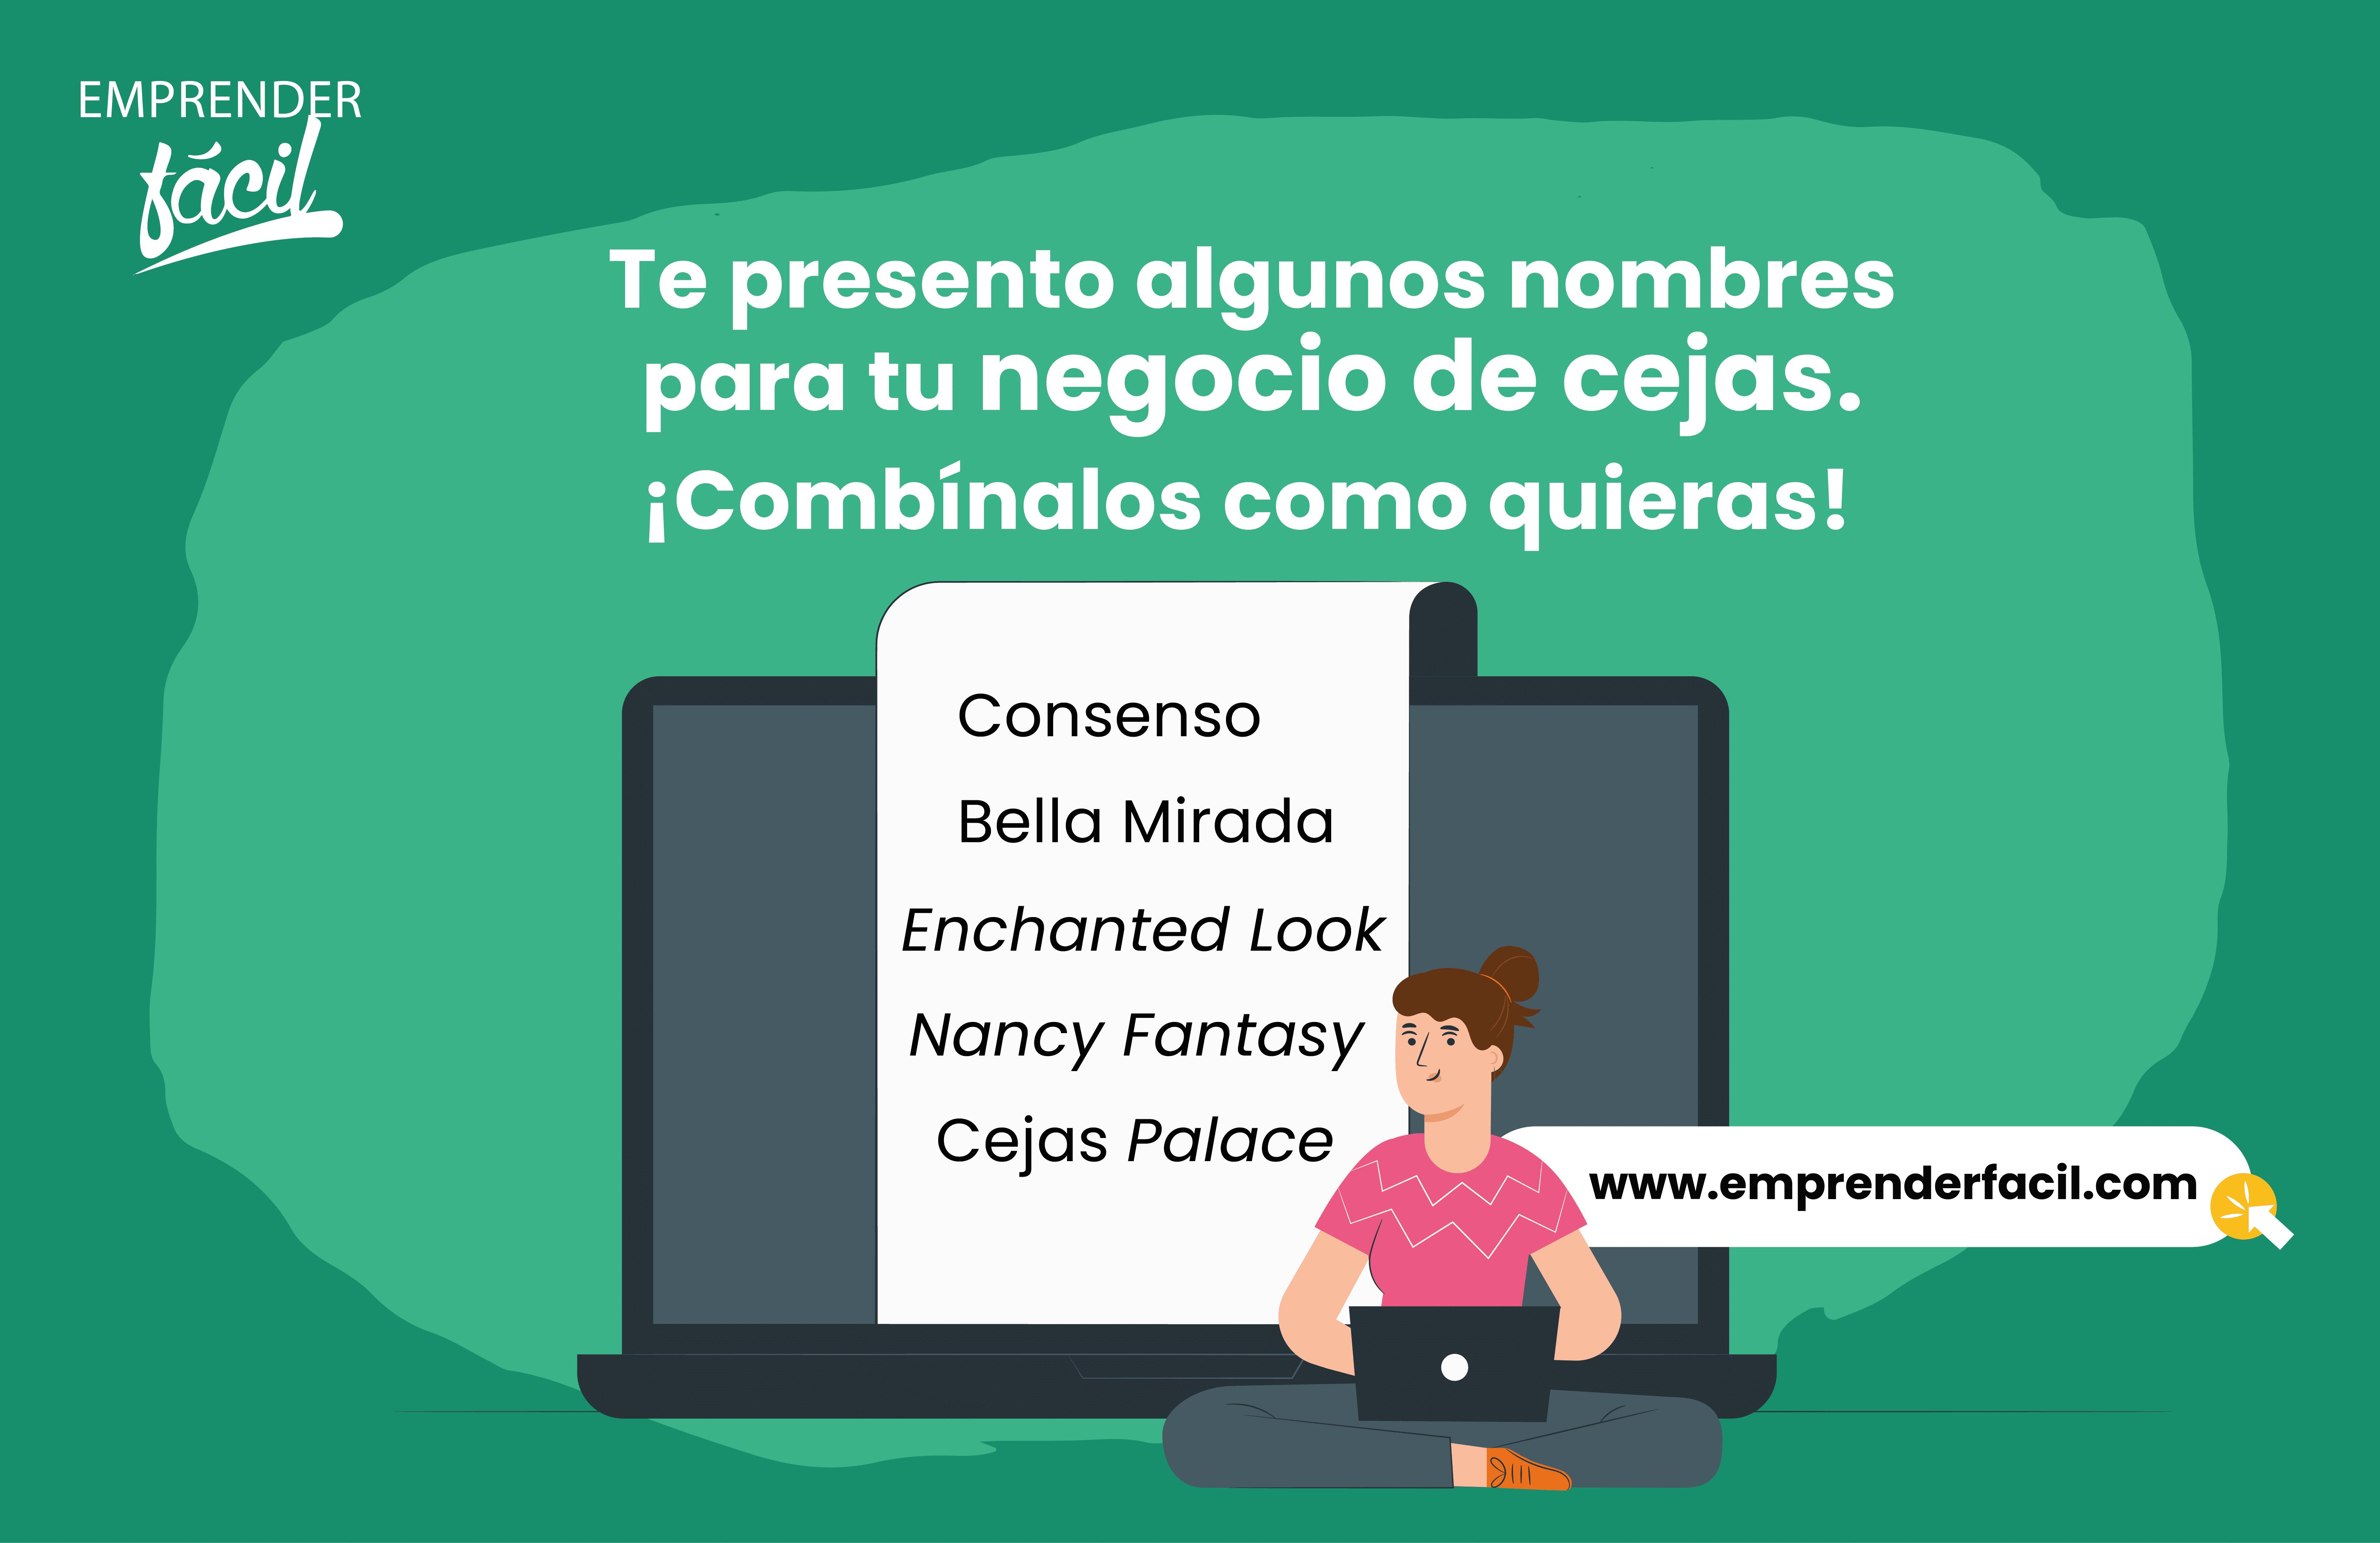 Ejemplos de Nombres para Negocios de Cejas.